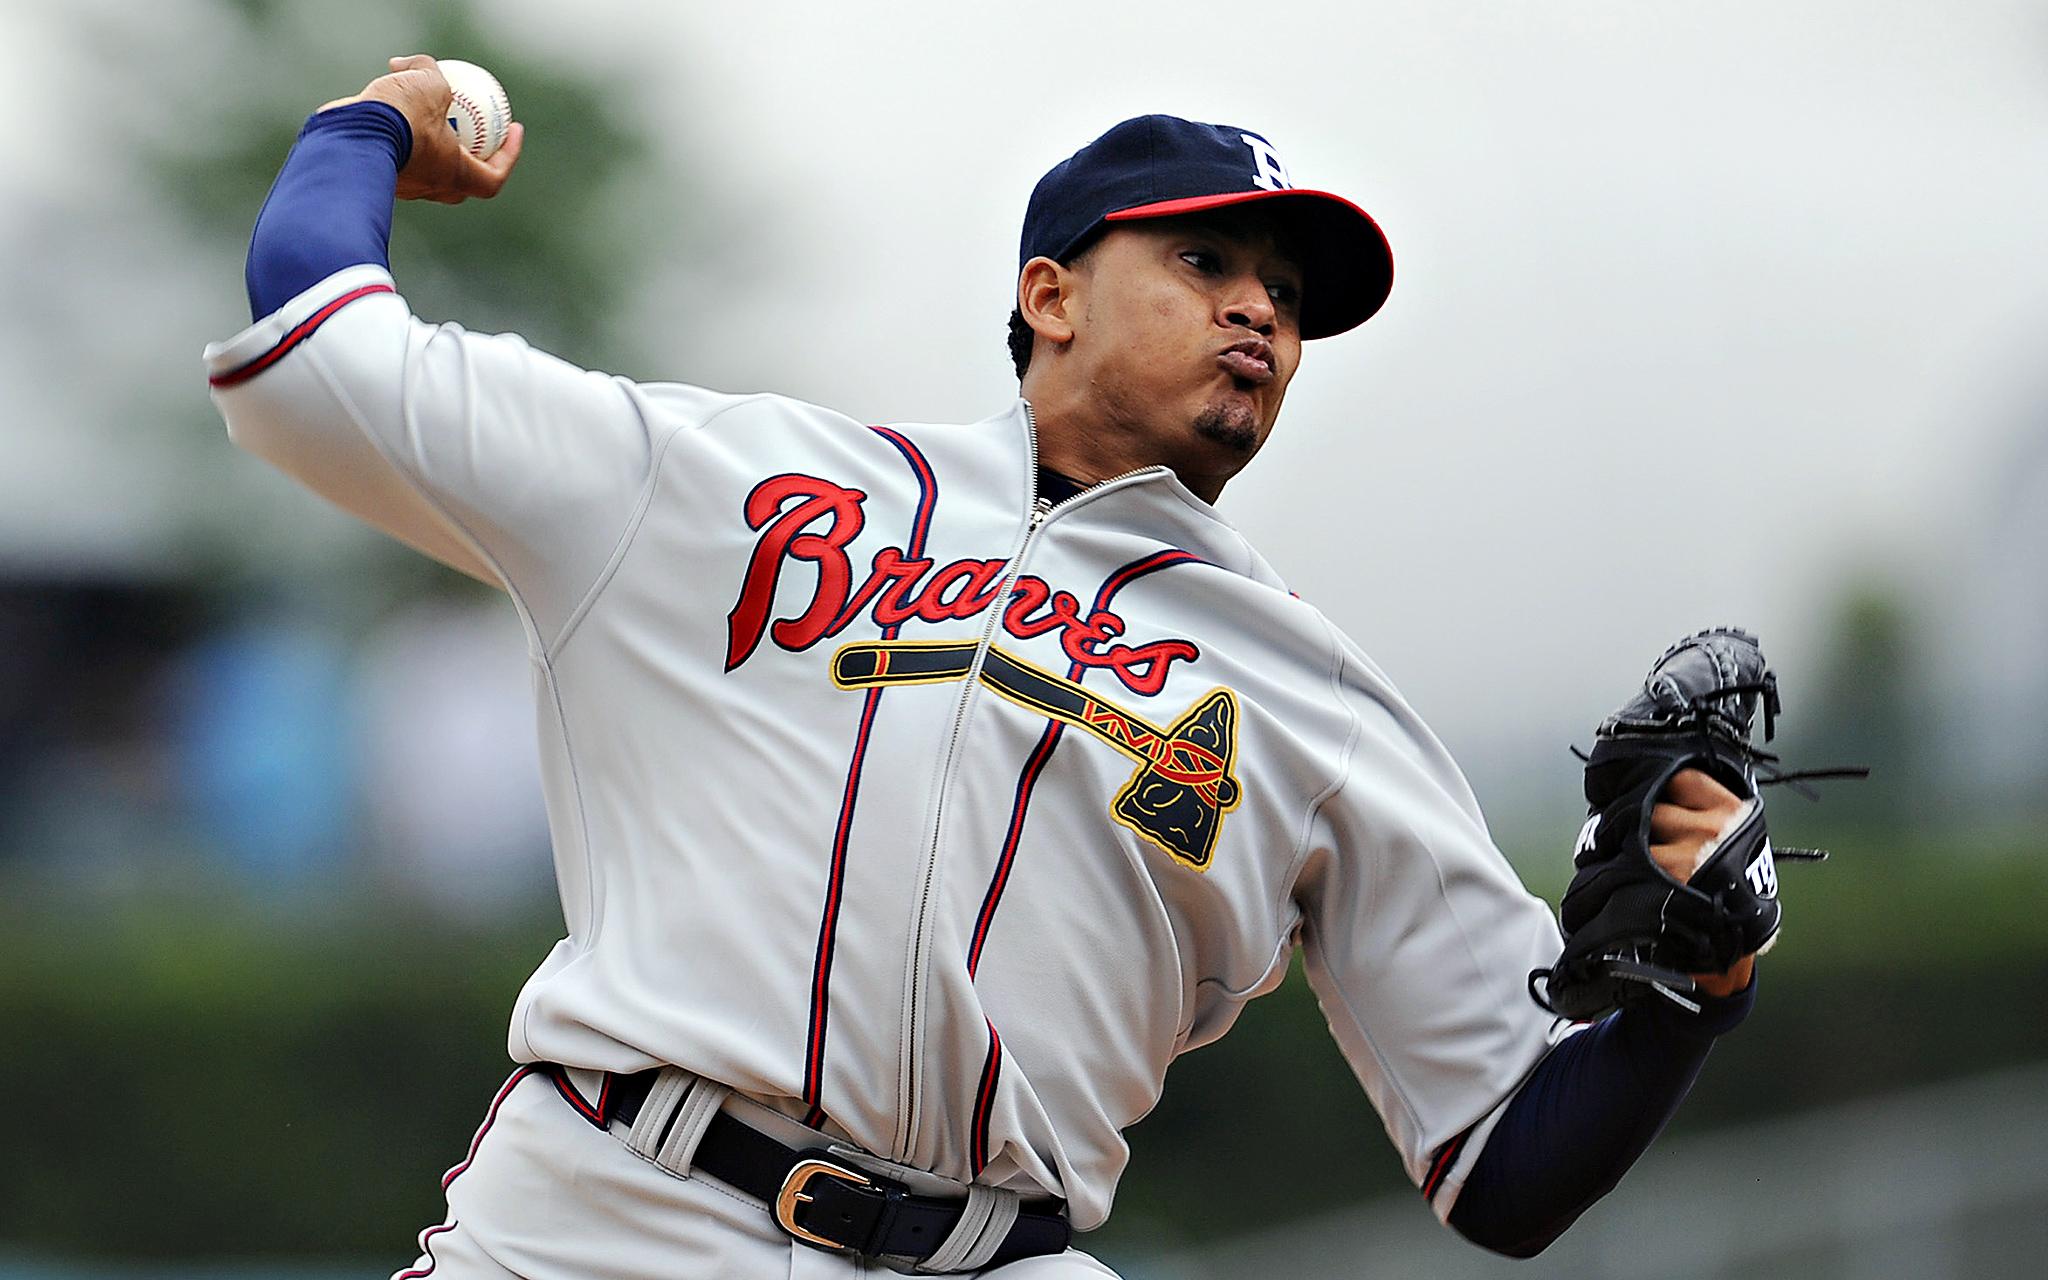 new product b7ccb c3391 Atlanta Braves (2011) - Throwback Uniforms - ESPN